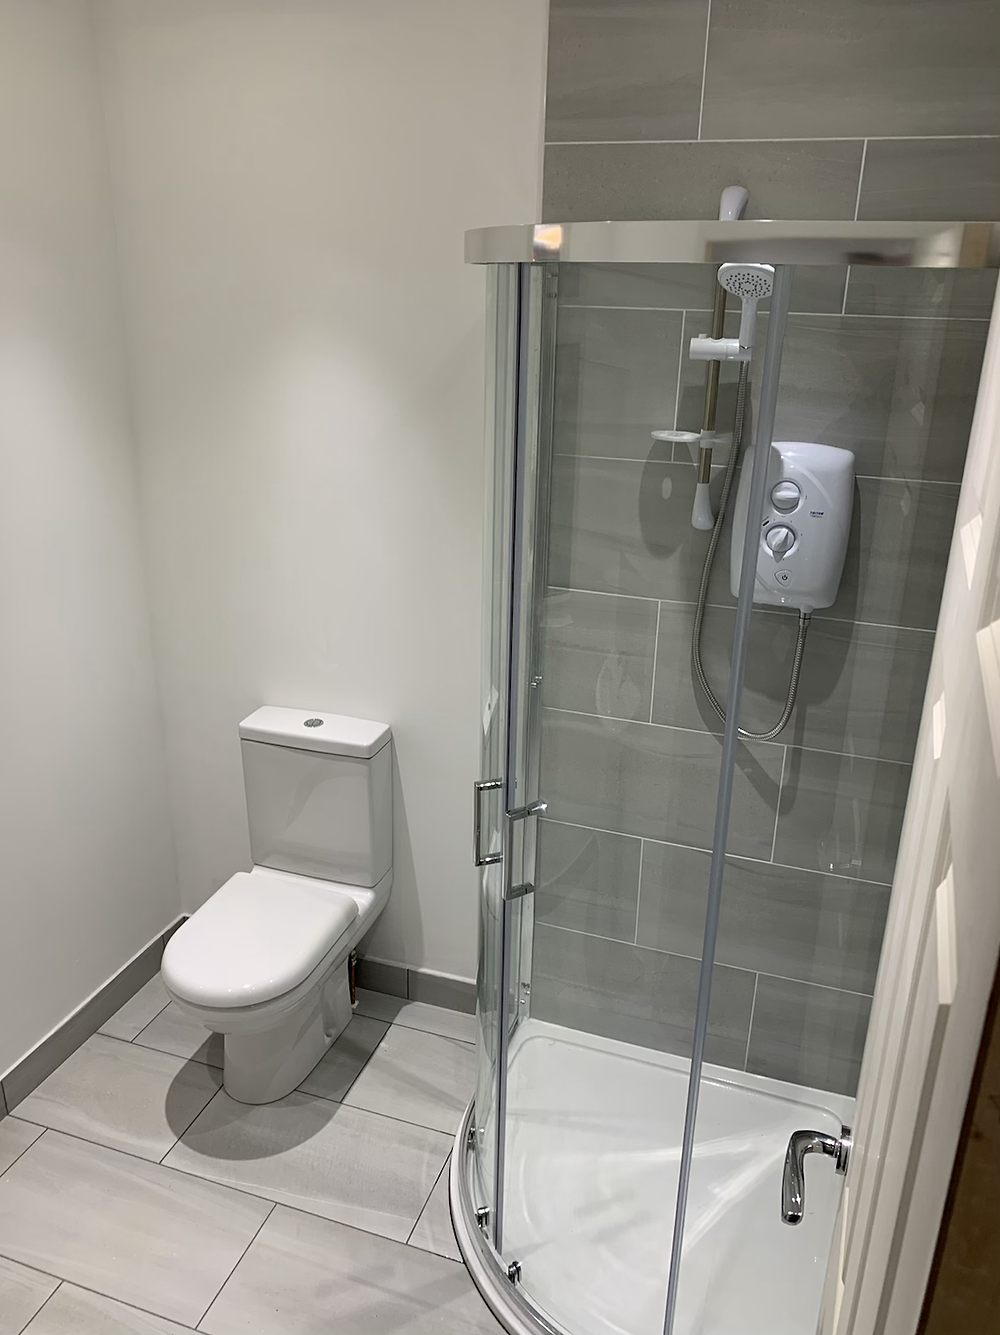 Dormer loft conversion Cricklewood NW2 London Bathroom